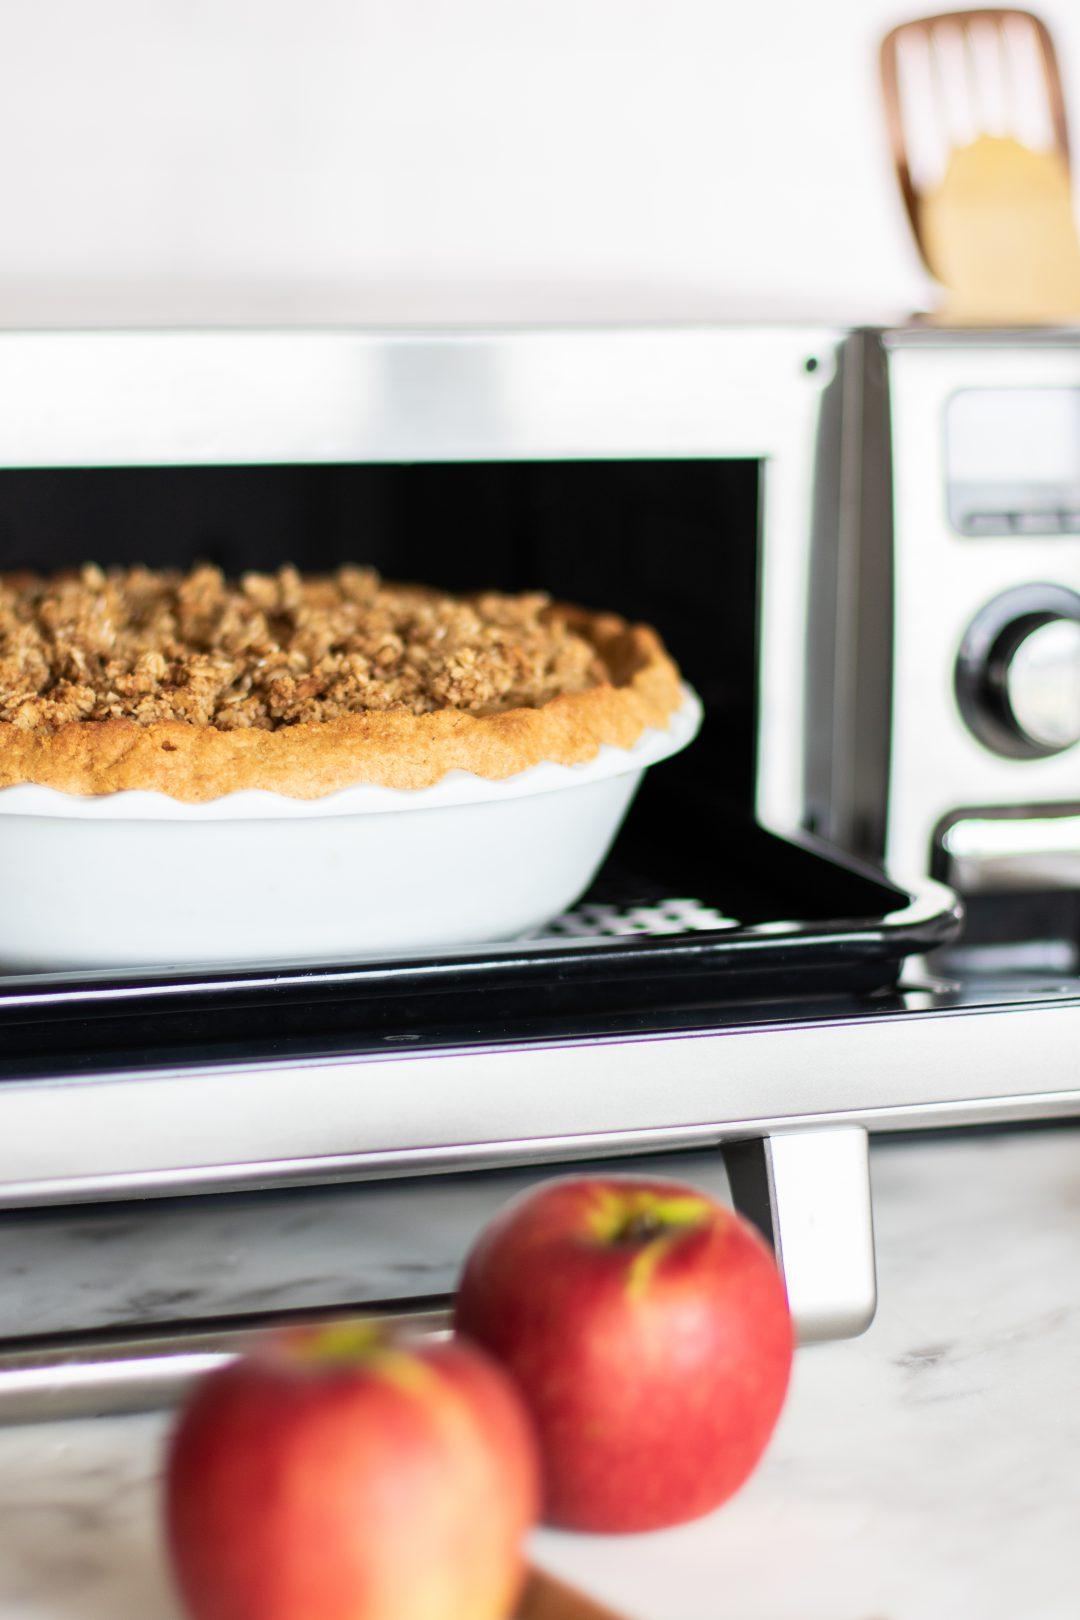 Pie being prepared in a Sharp Supersteam Countertop Oven.